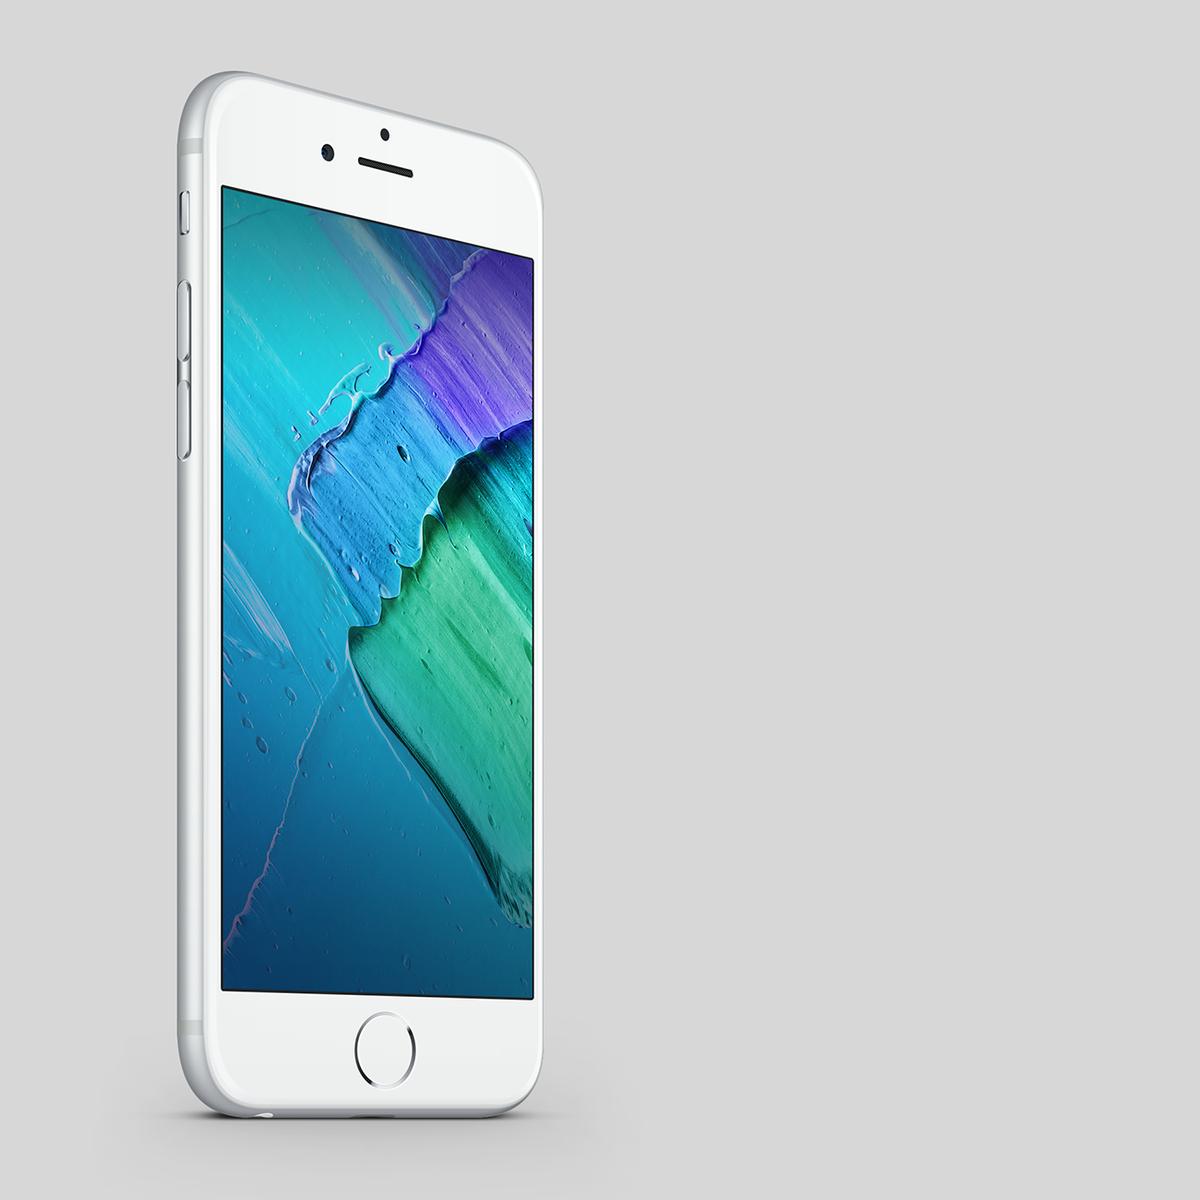 AR7 On Twitter Moto X Style 2015 Stock Wallpaper For IPhone6Plus IPhone6 Tco RDD728AMNi GgEkJiBUmg